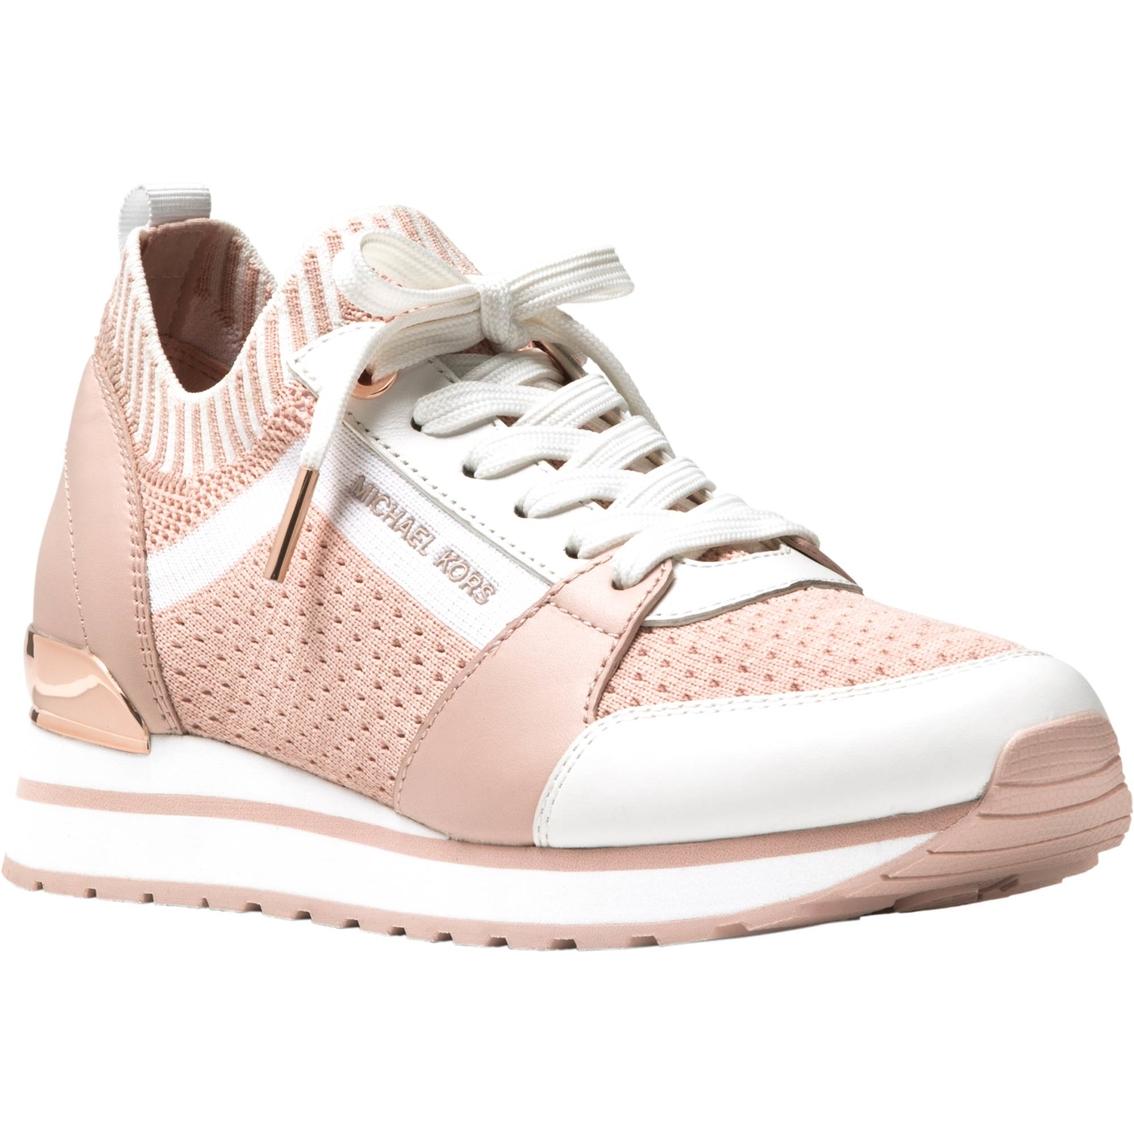 41aa11cd2 Michael Kors Billie Knit Trainer Walking Shoes | Cross Training ...